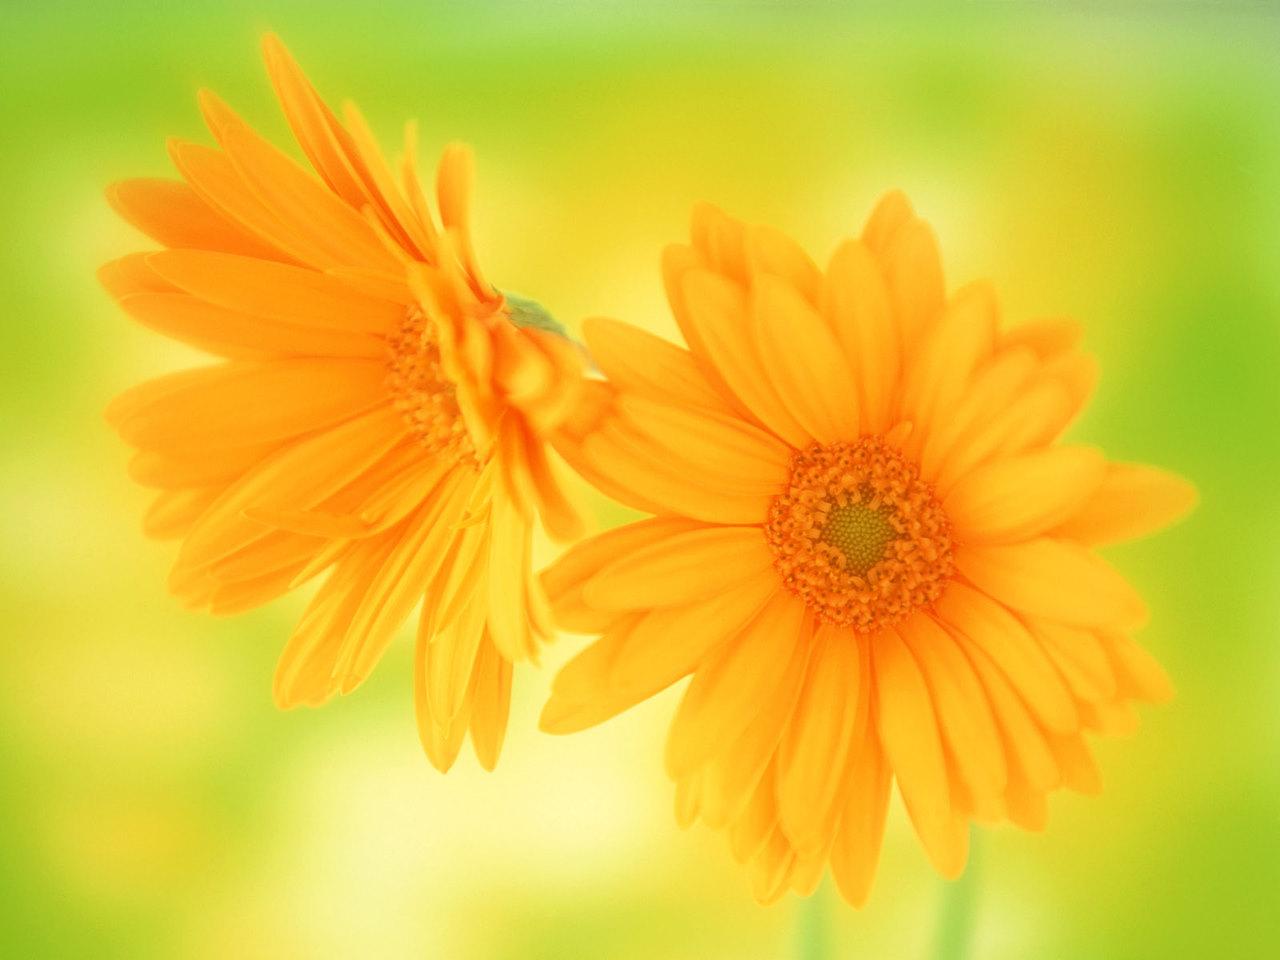 Wallpaper beautiful flowers wallpaper free download 1280x960 izmirmasajfo Image collections